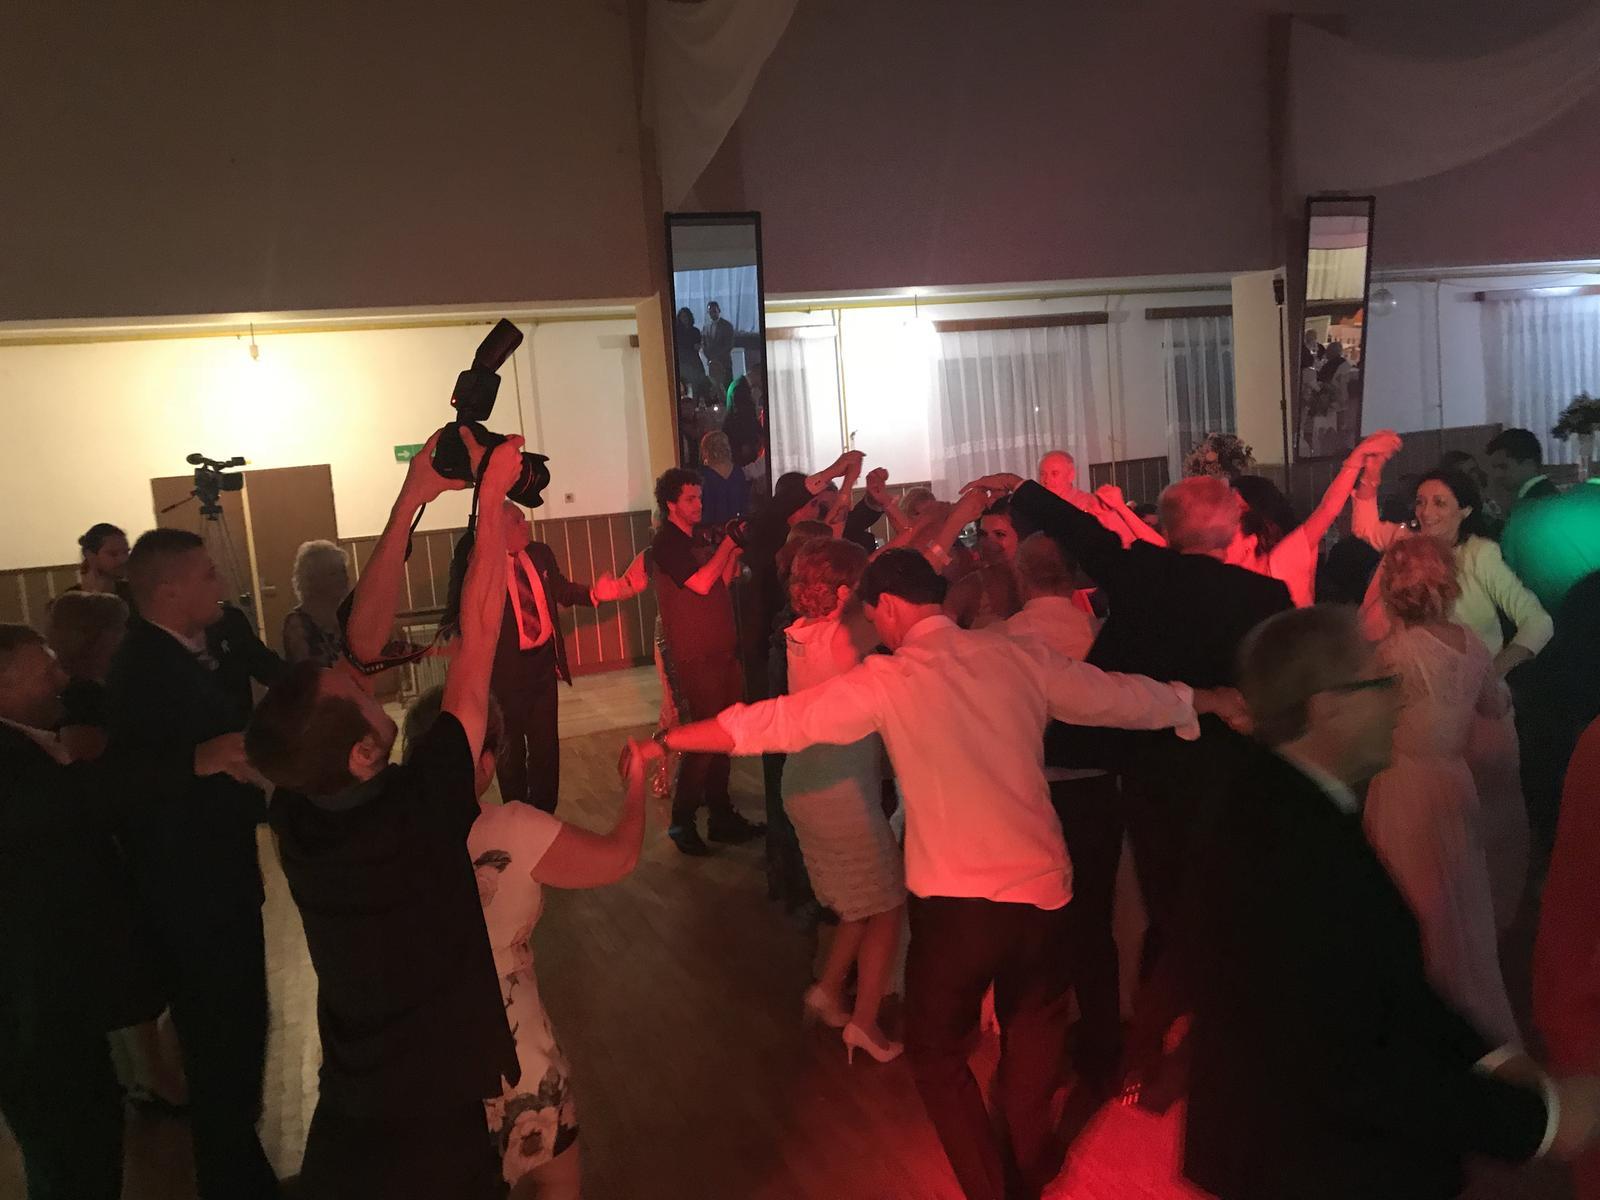 f52390d1c Dj svadba party, - 399 € | Svadobné shopy | Mojasvadba.sk